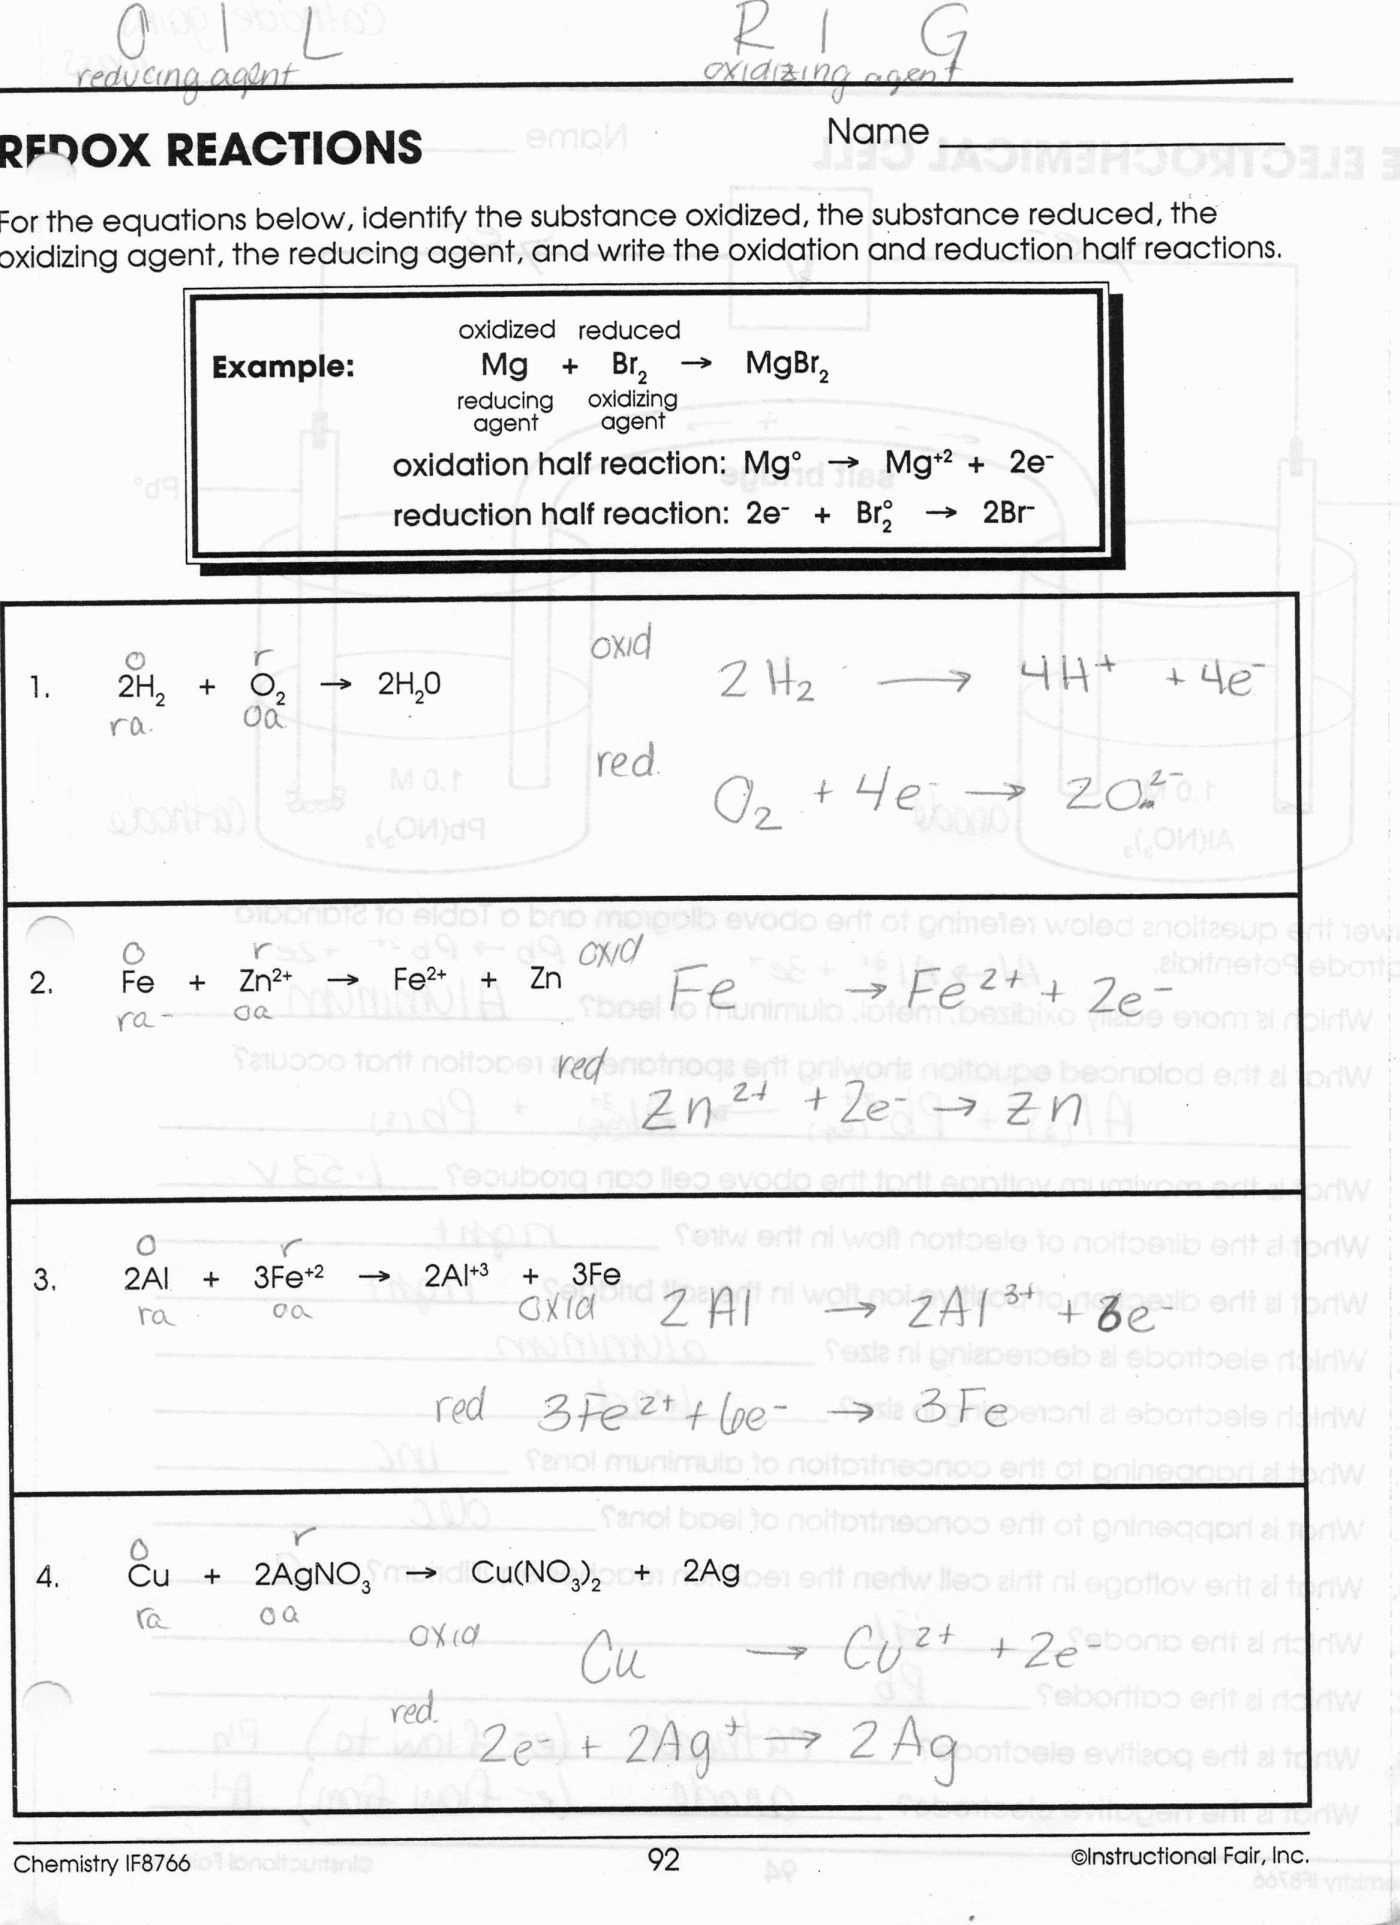 Chemical Bonding Worksheet Answers — db excel.com